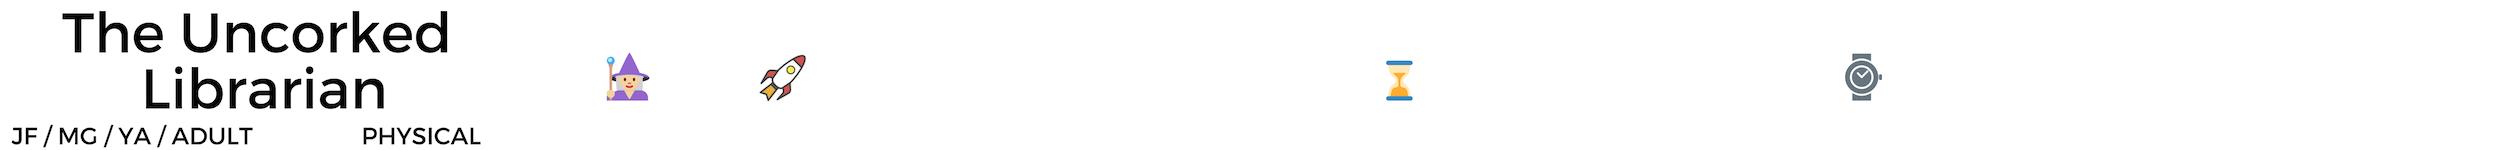 BOOK BLOG COMMUNITY _ BANNER + PROFILES [2500 x 150] (11).jpg